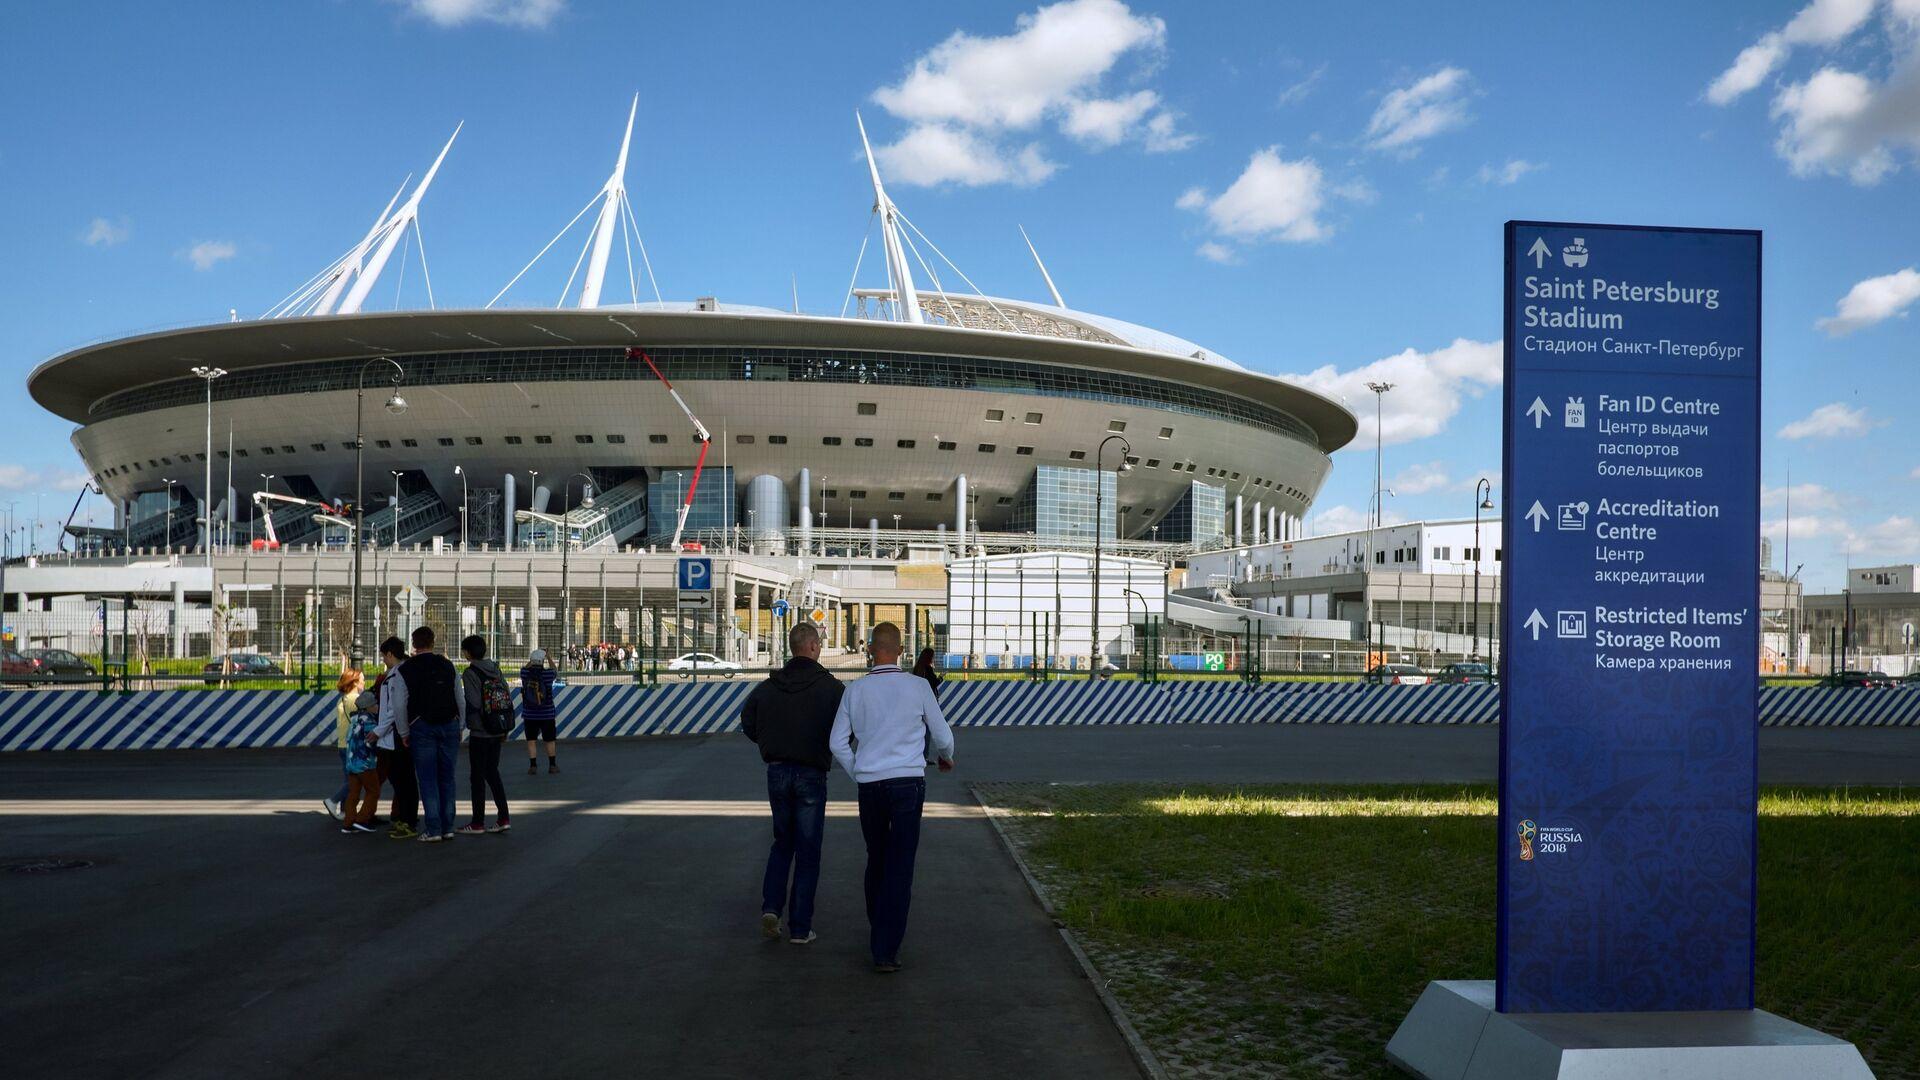 Стадион Санкт-Петербург - РИА Новости, 1920, 11.02.2021